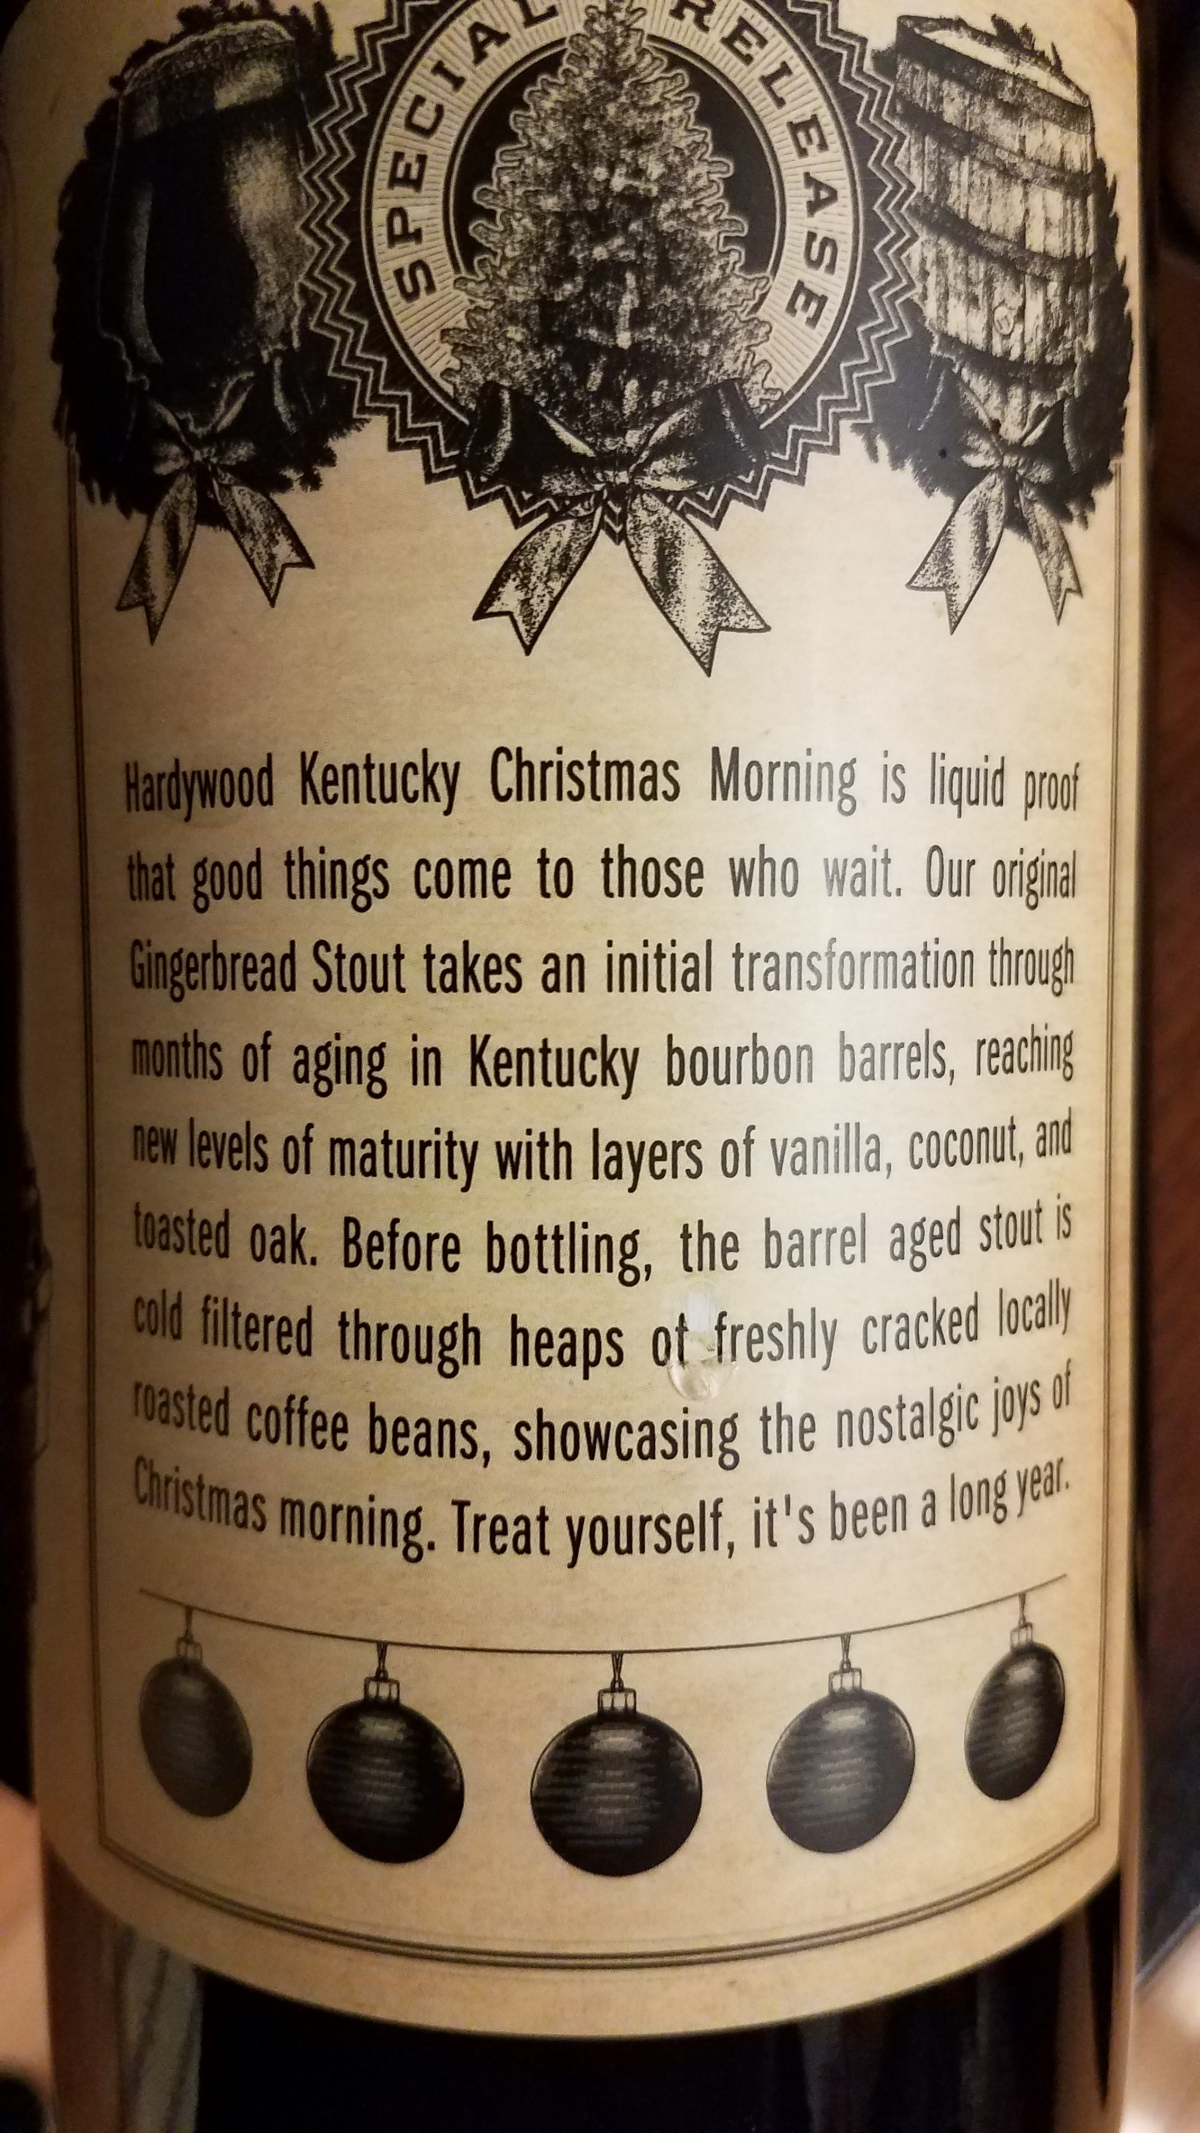 Hardywood Park Kentucky Christmas Morning (2017) / MyBeerCollectibles